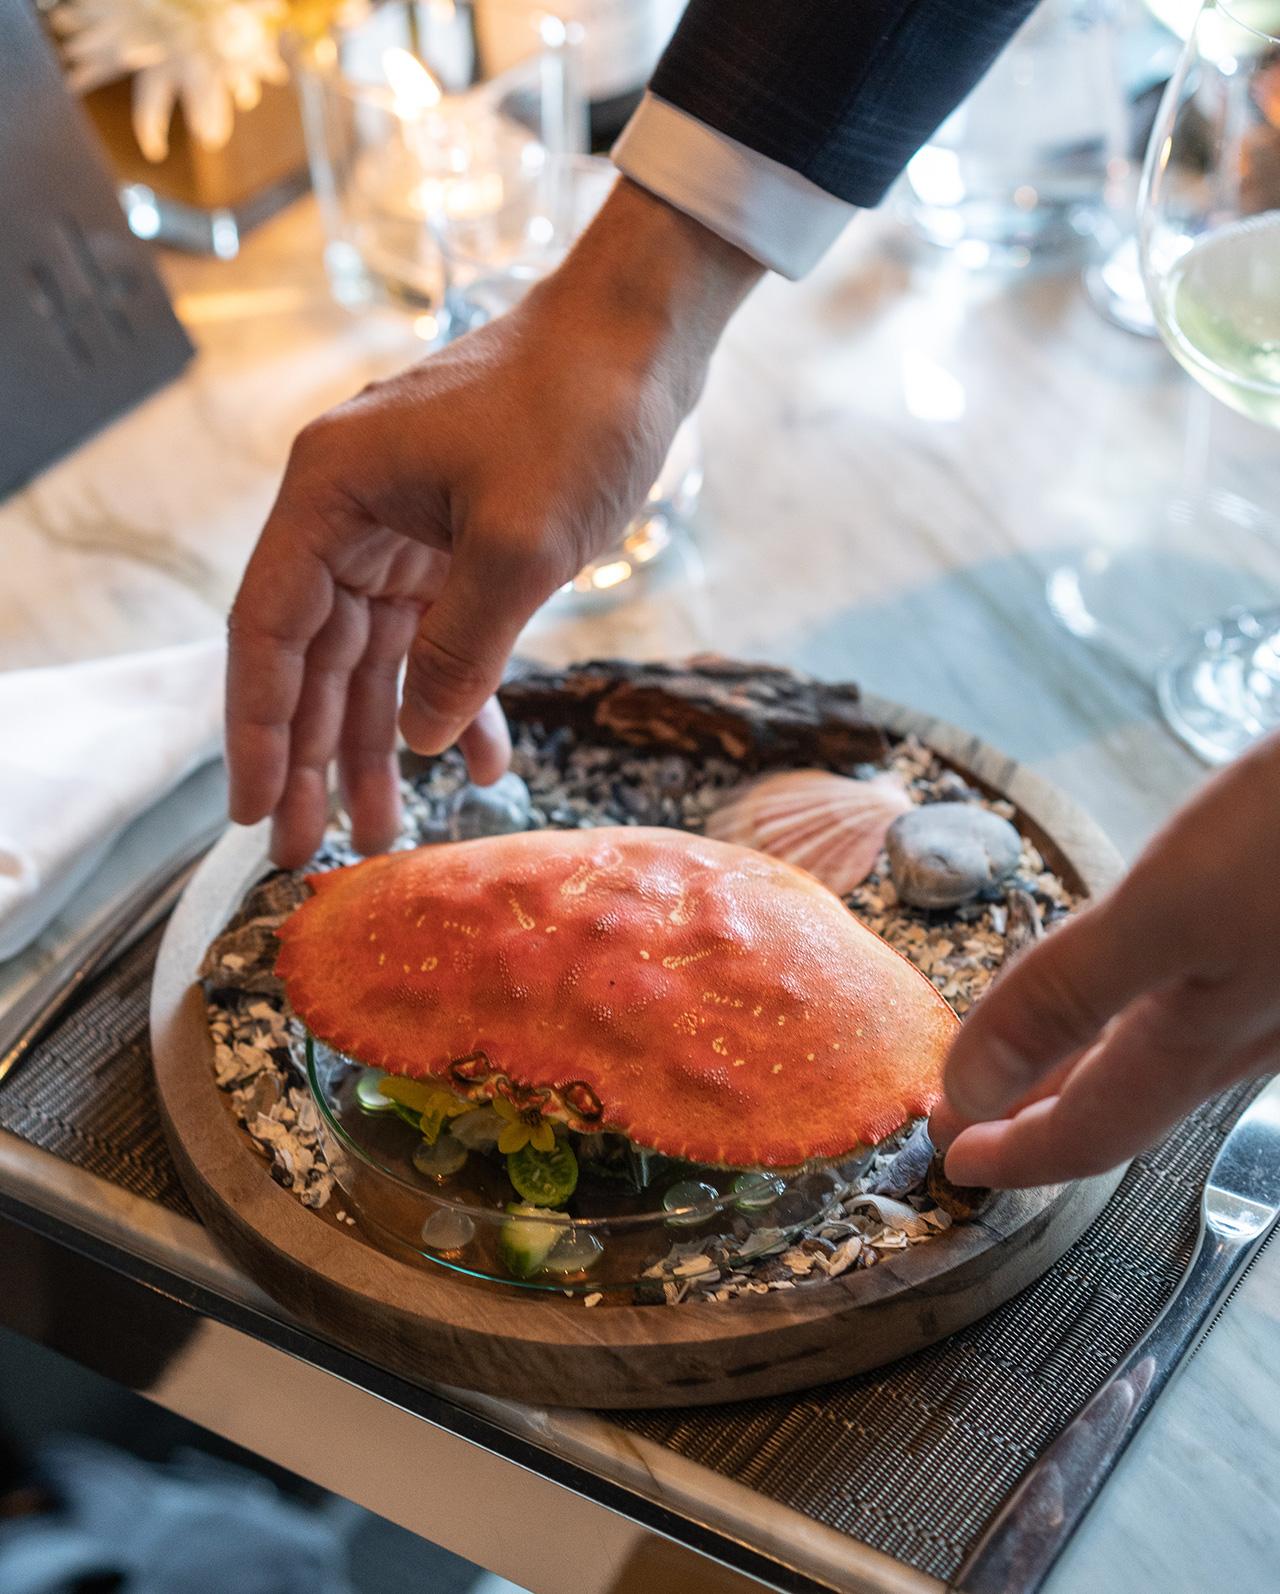 Hawksworth Restaurant Summer BC Tasting Menu by Pendulum Magazine